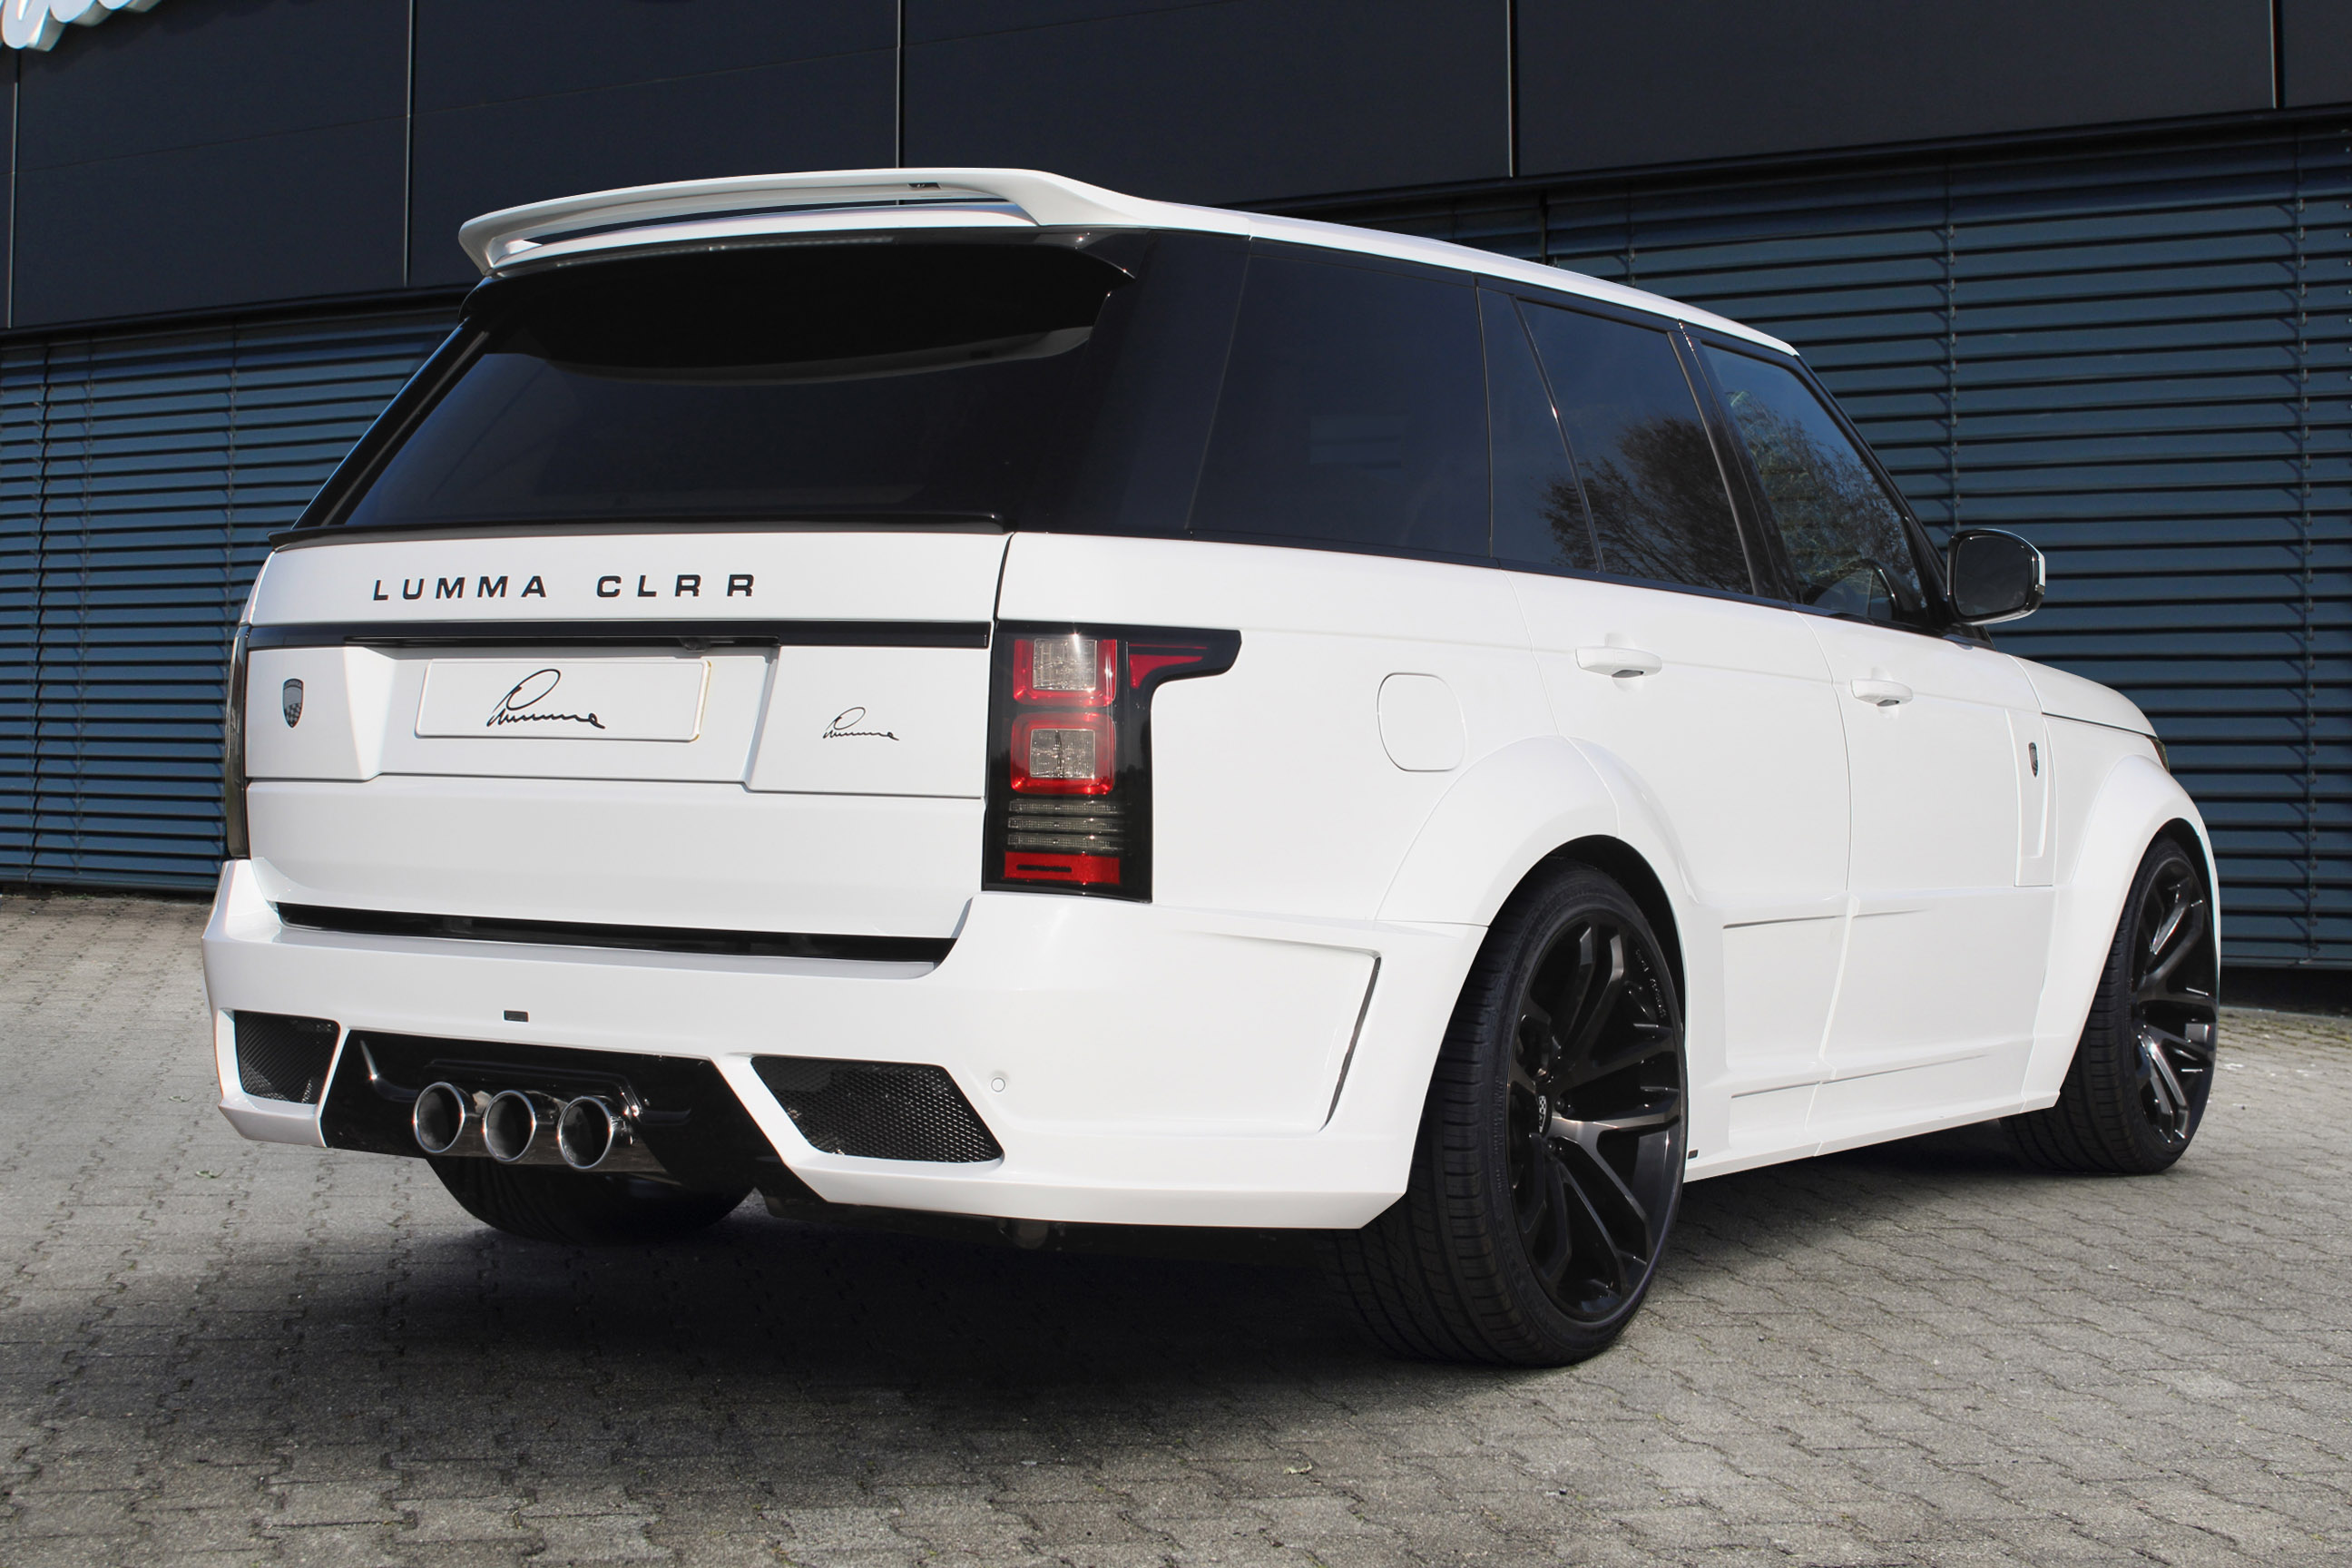 2014 Lumma Range Rover CLR R GT Evo